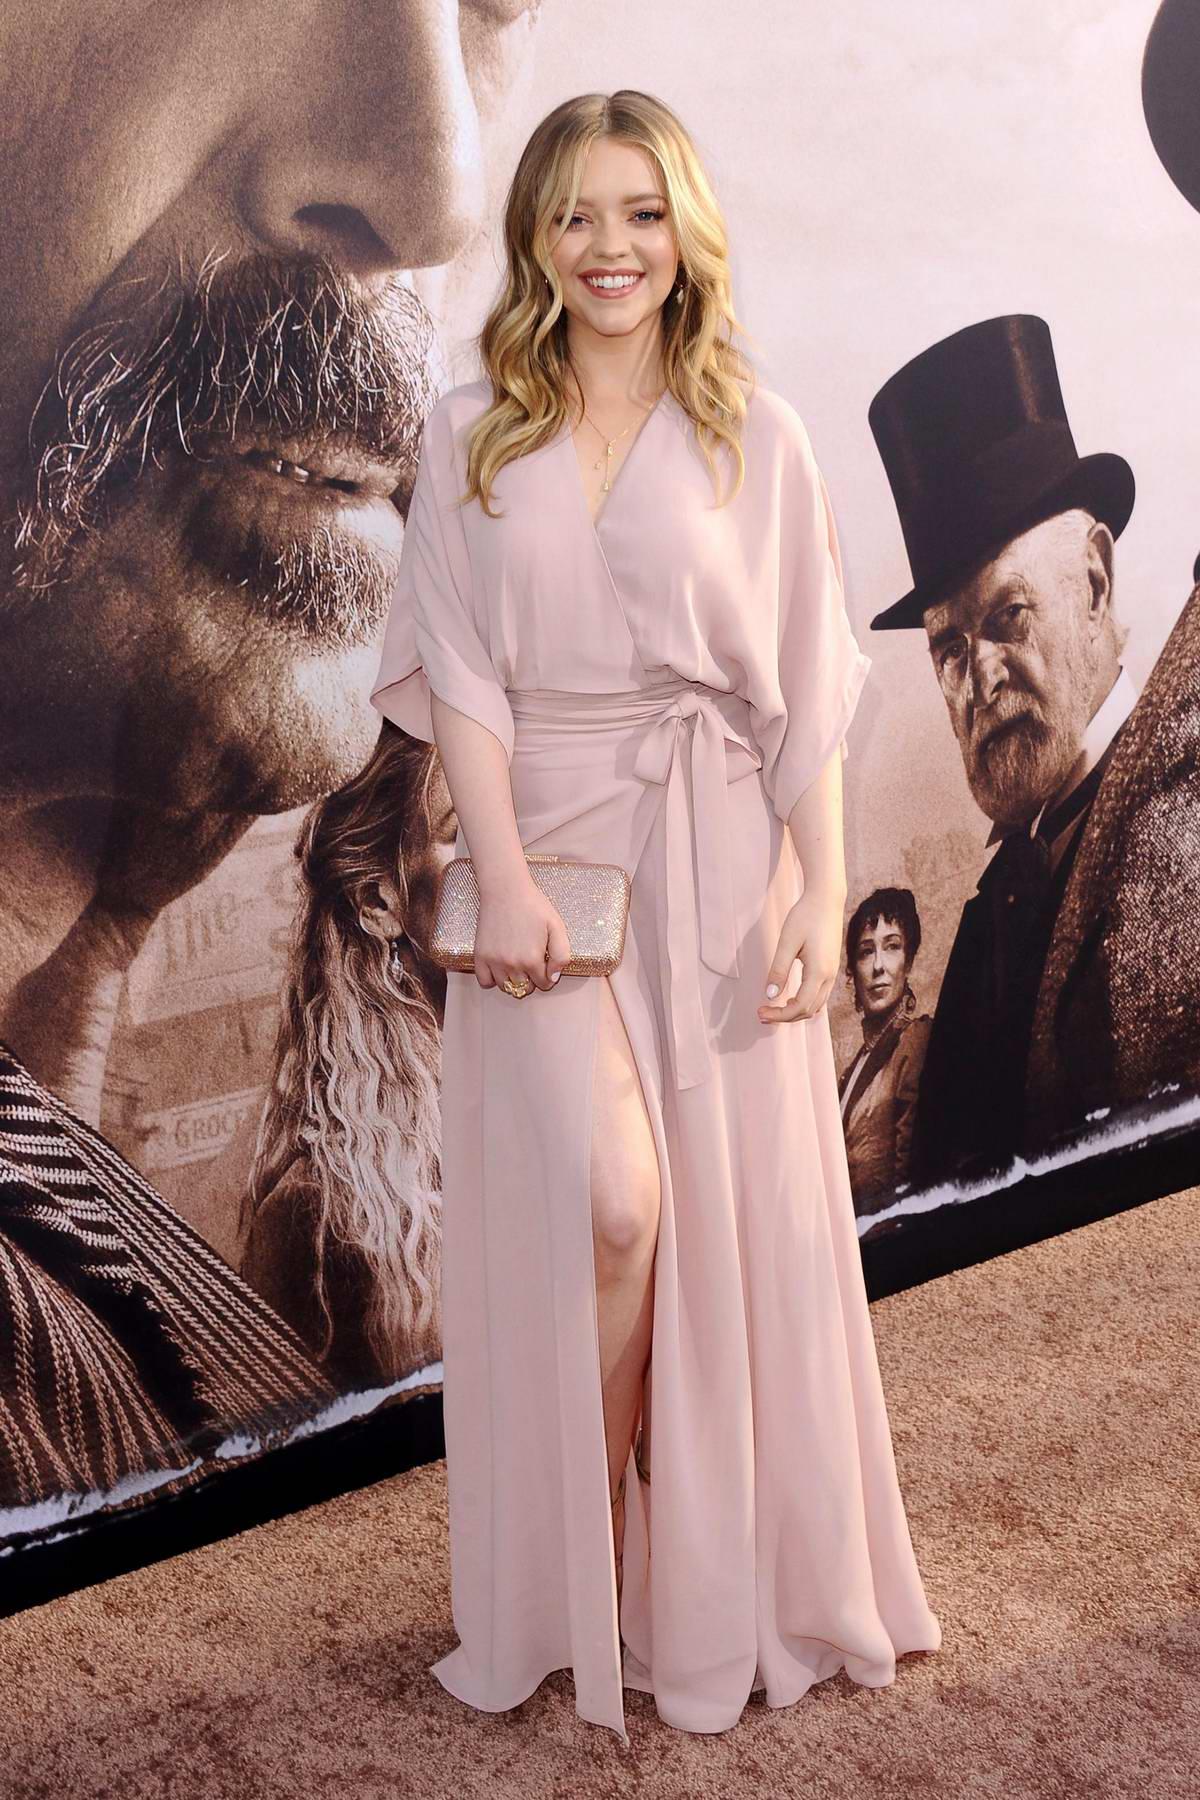 Jade Pettyjohn attends 'Deadwood' film premiere at Cinerama Dome in Los Angeles